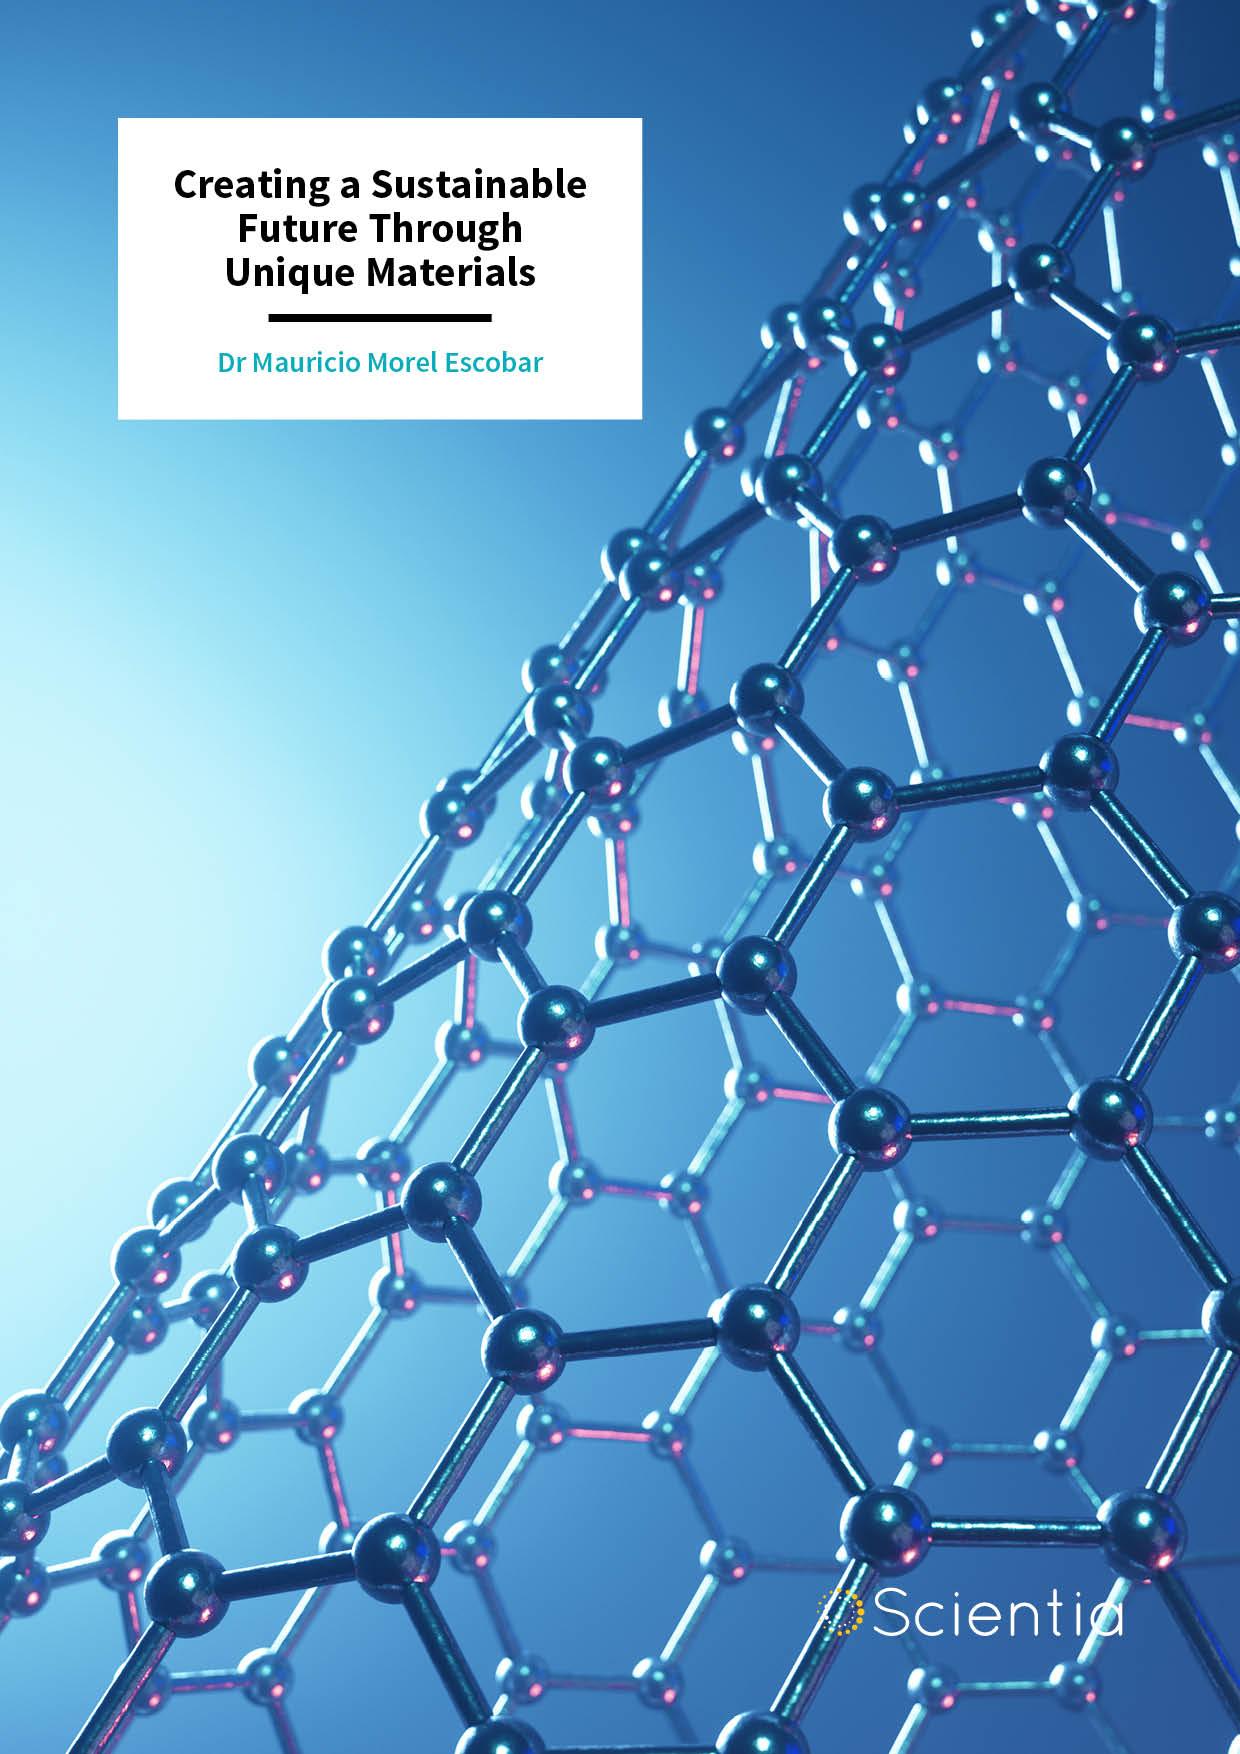 Dr Mauricio Morel Escobar – Creating a Sustainable Future Through Unique Materials